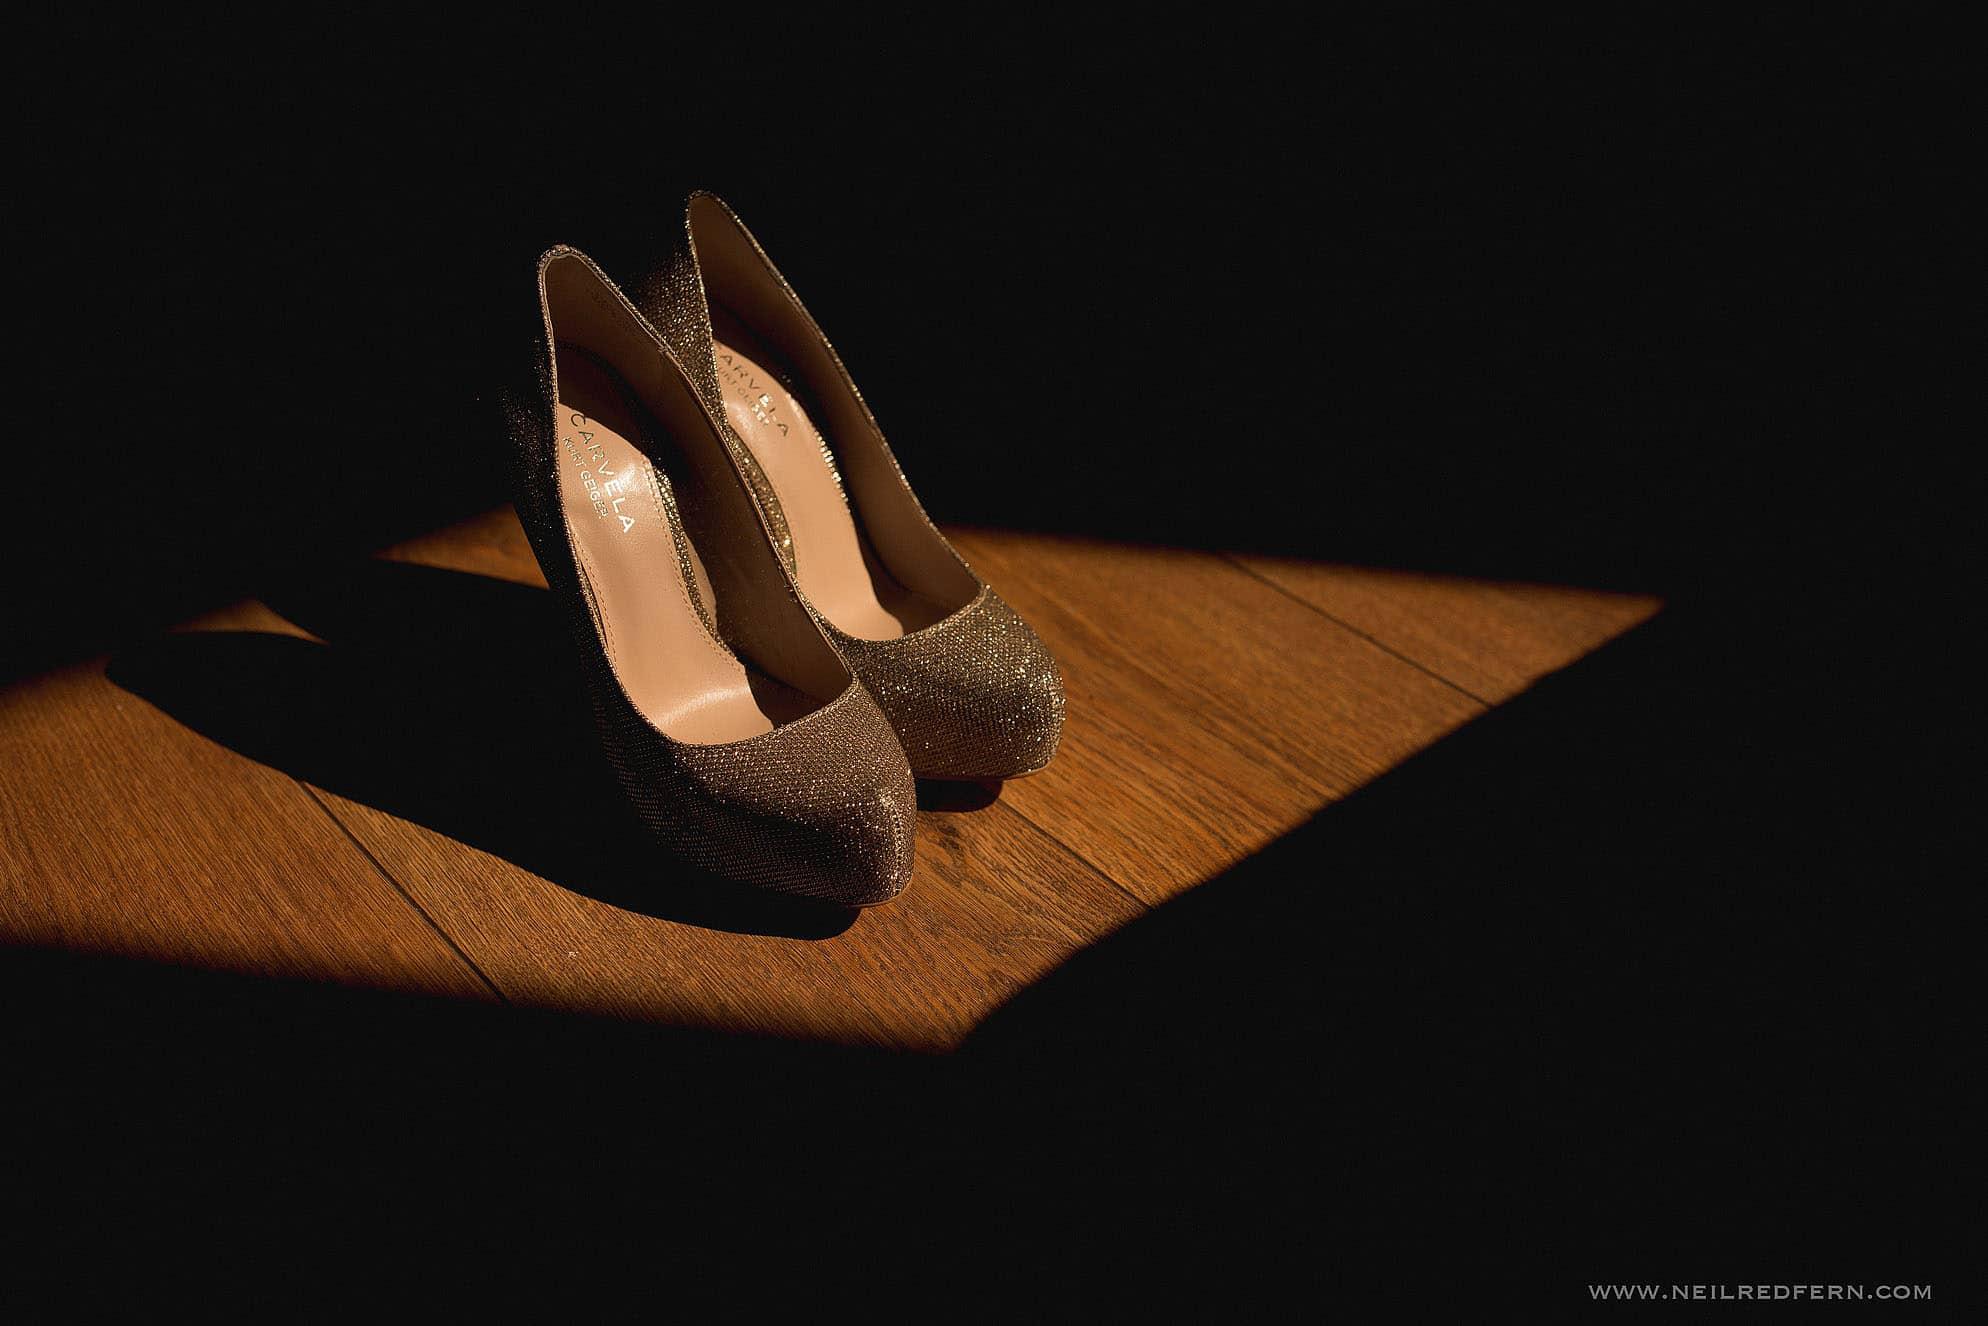 photograph of bride's shoes